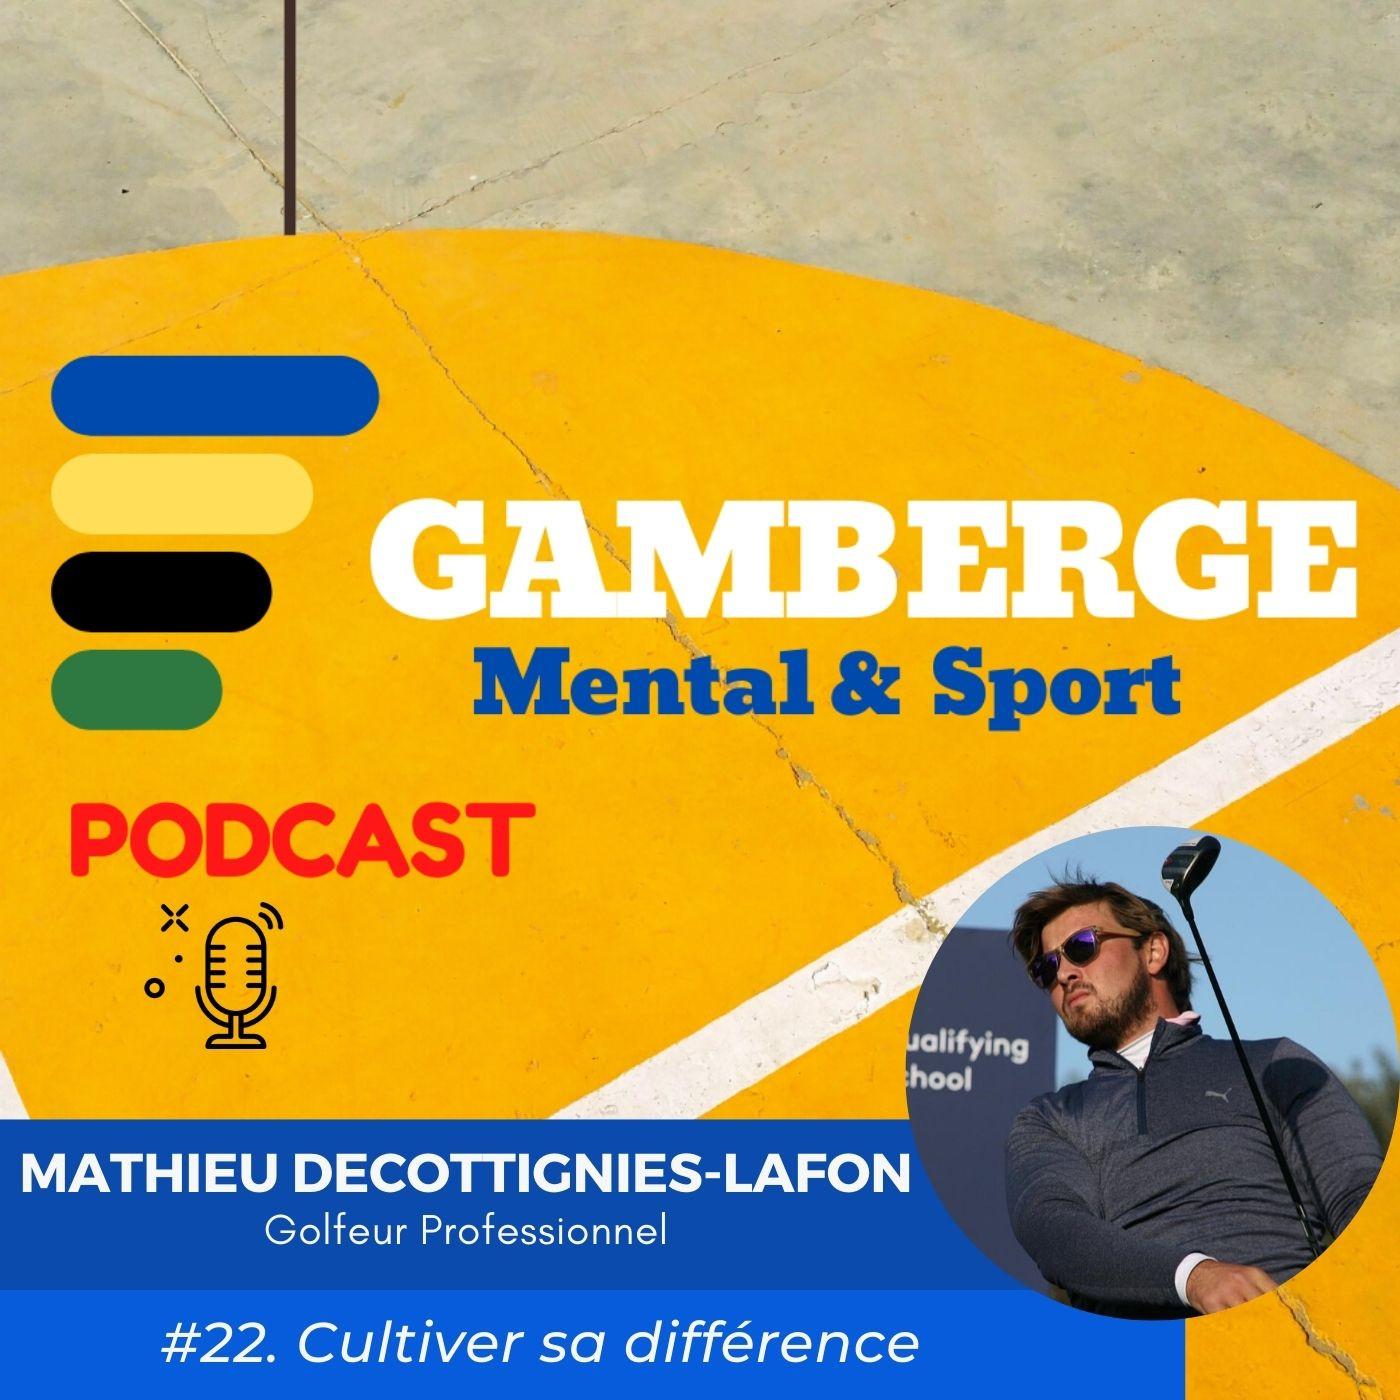 #22. Mathieu Decottignies-Lafon: Cultiver sa différence